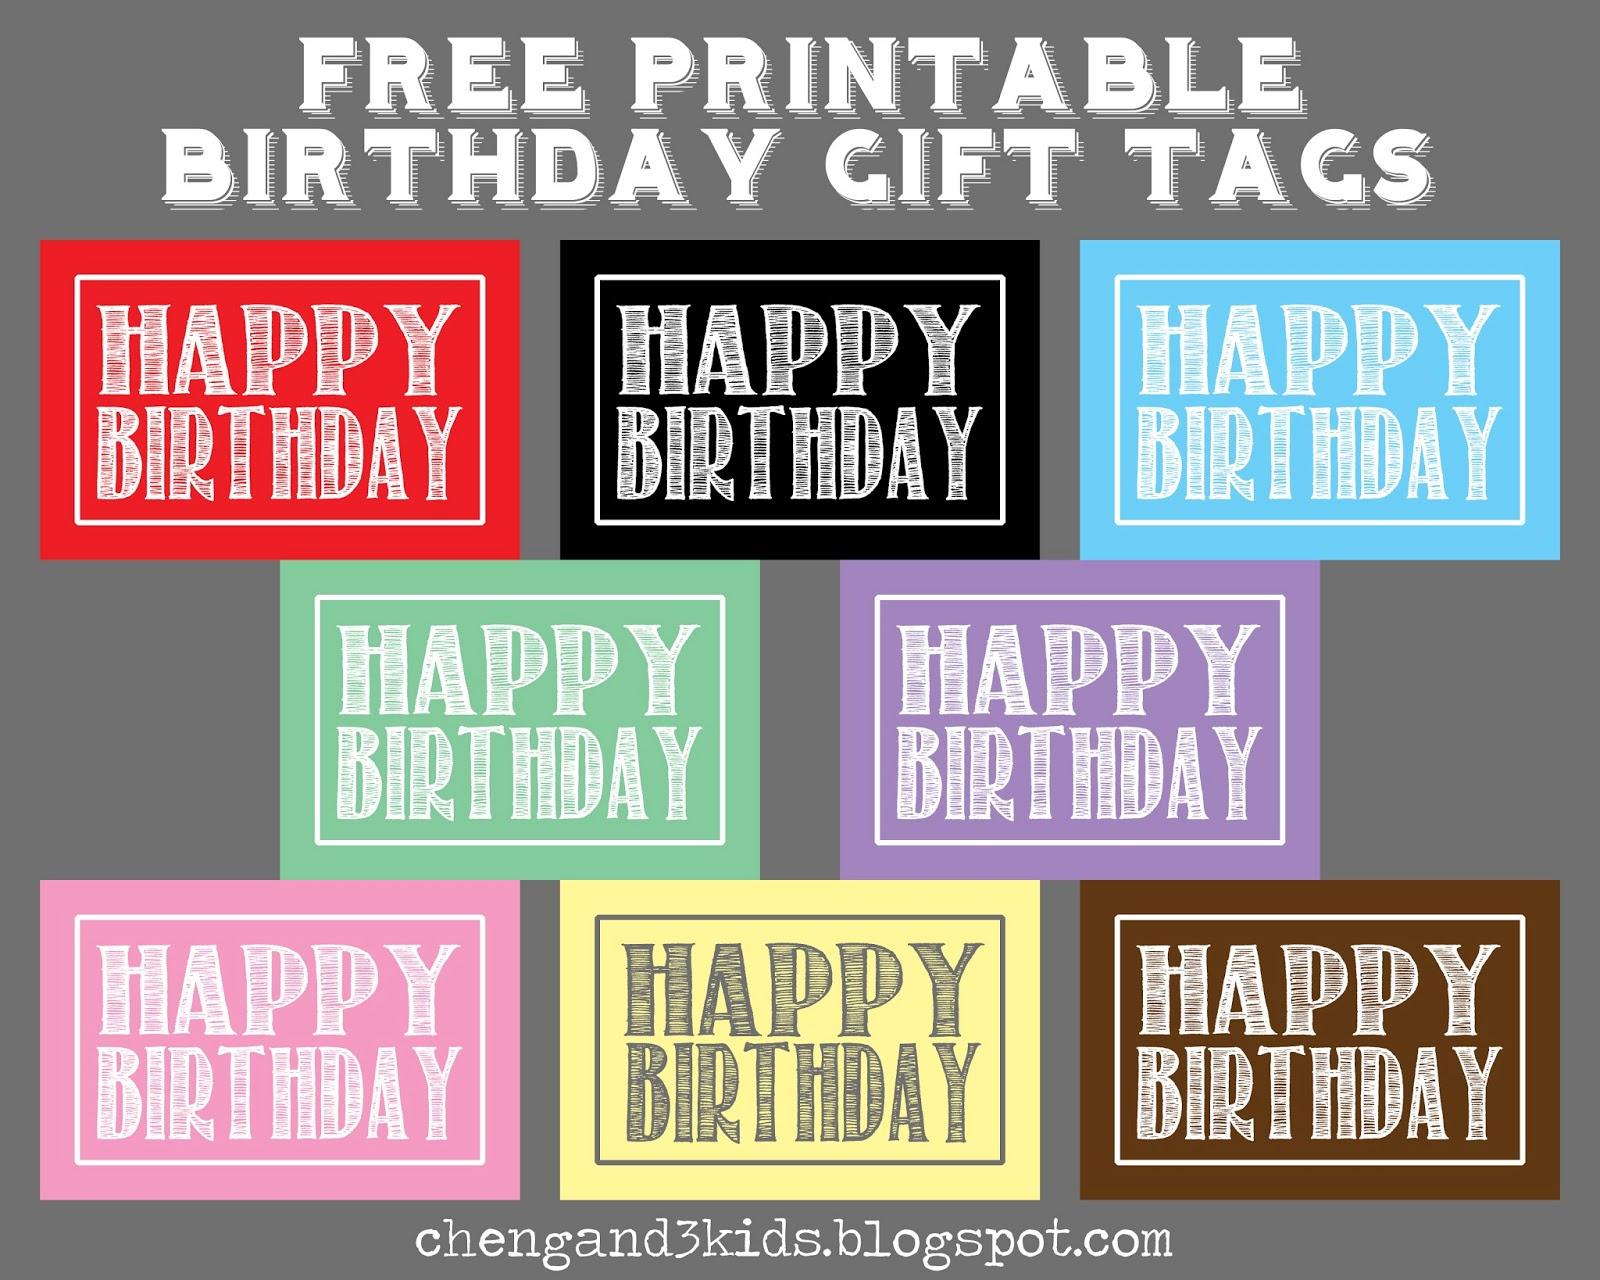 Cheng And 3 Kids: Free Printable Birthday Gift Tags - Free Printable Birthday Tags